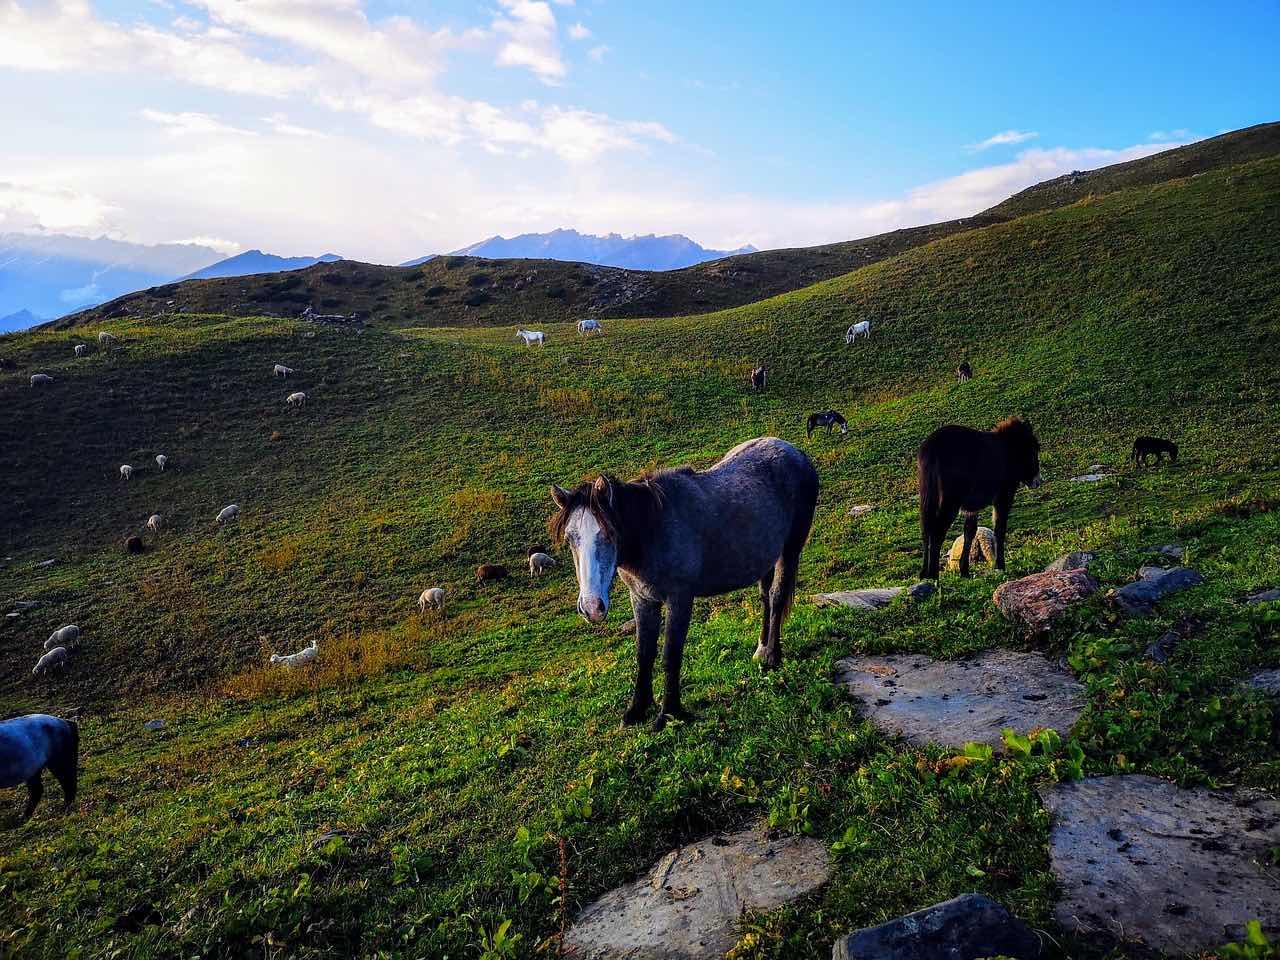 himachal pradesh_wild horses_PD